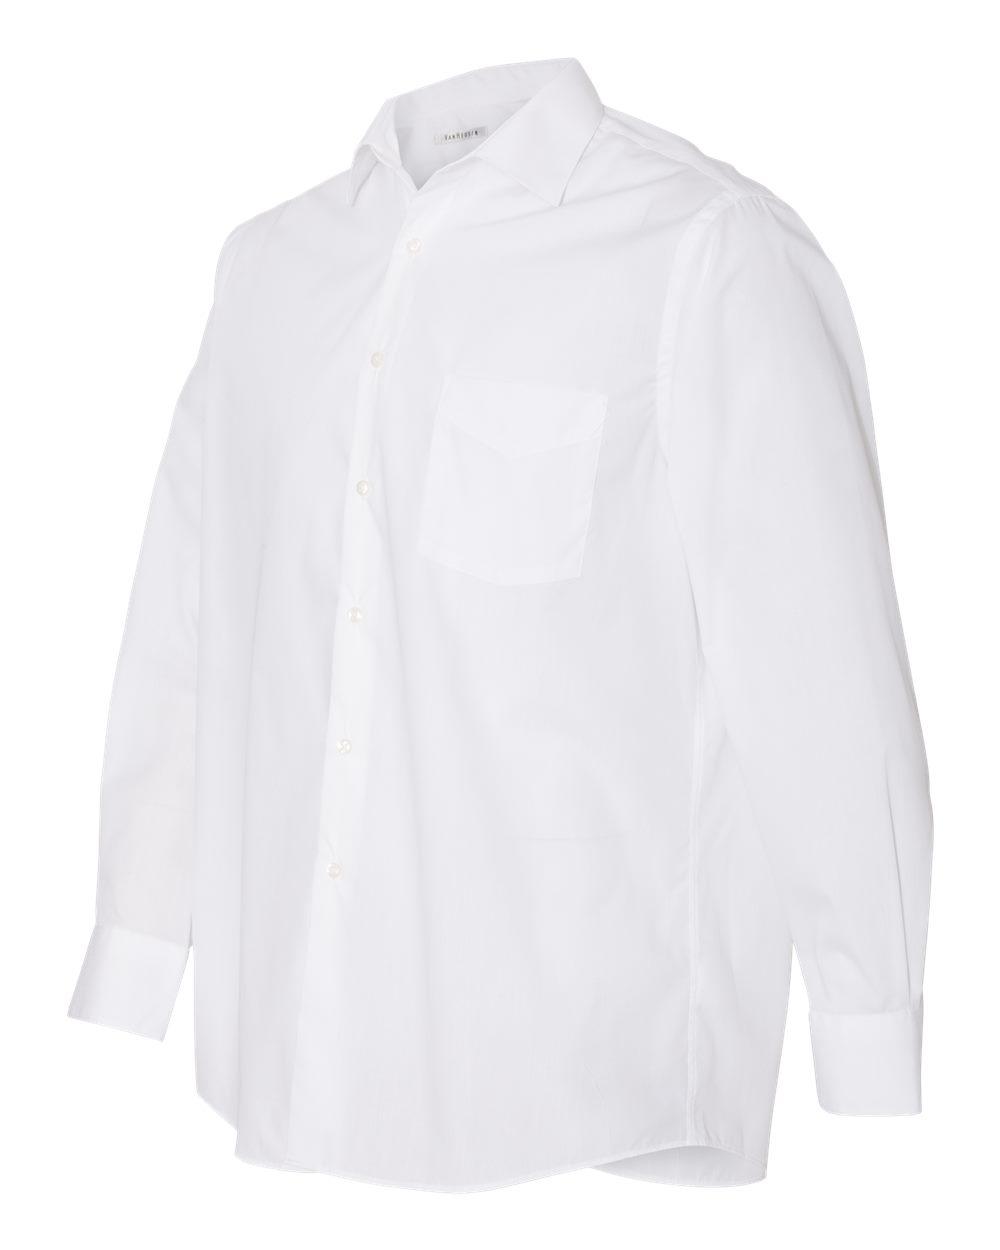 Van Heusen 13V0428 - Extreme Color Long Sleeve Shirt